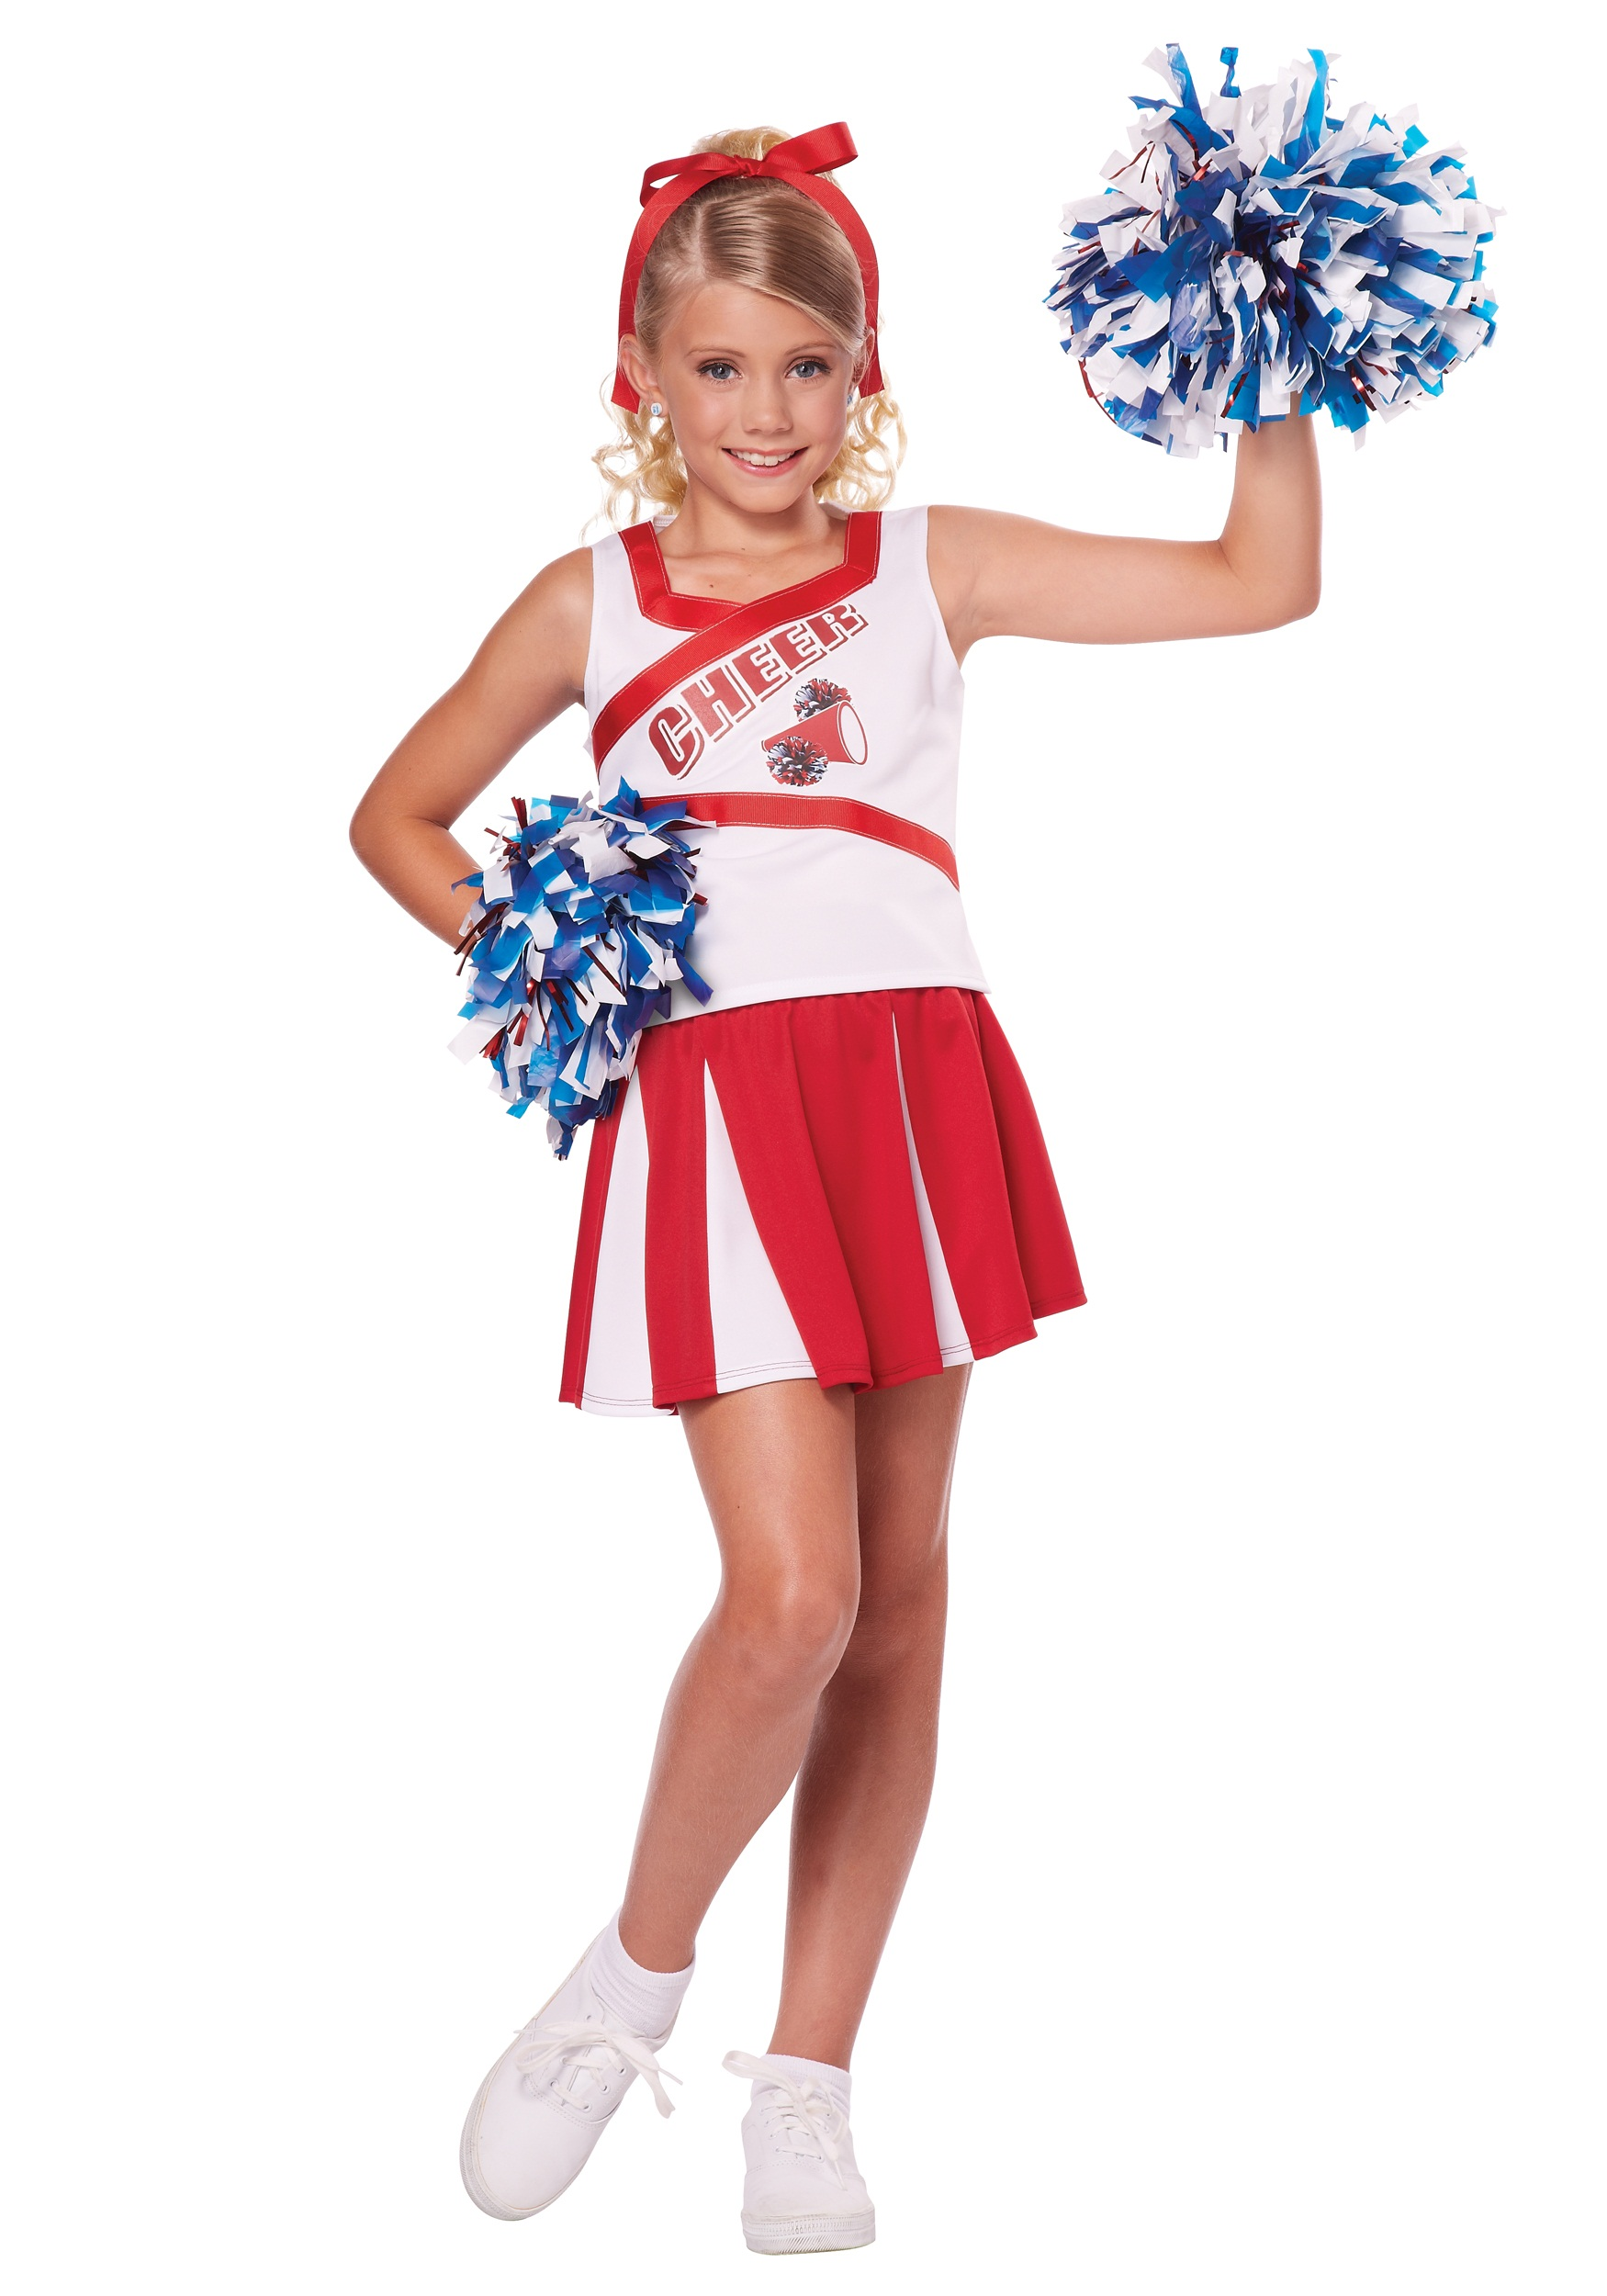 Cheerleader Pom Pom WHITE Poms Megaphone Costume Adult Child Cheer Leader Prop